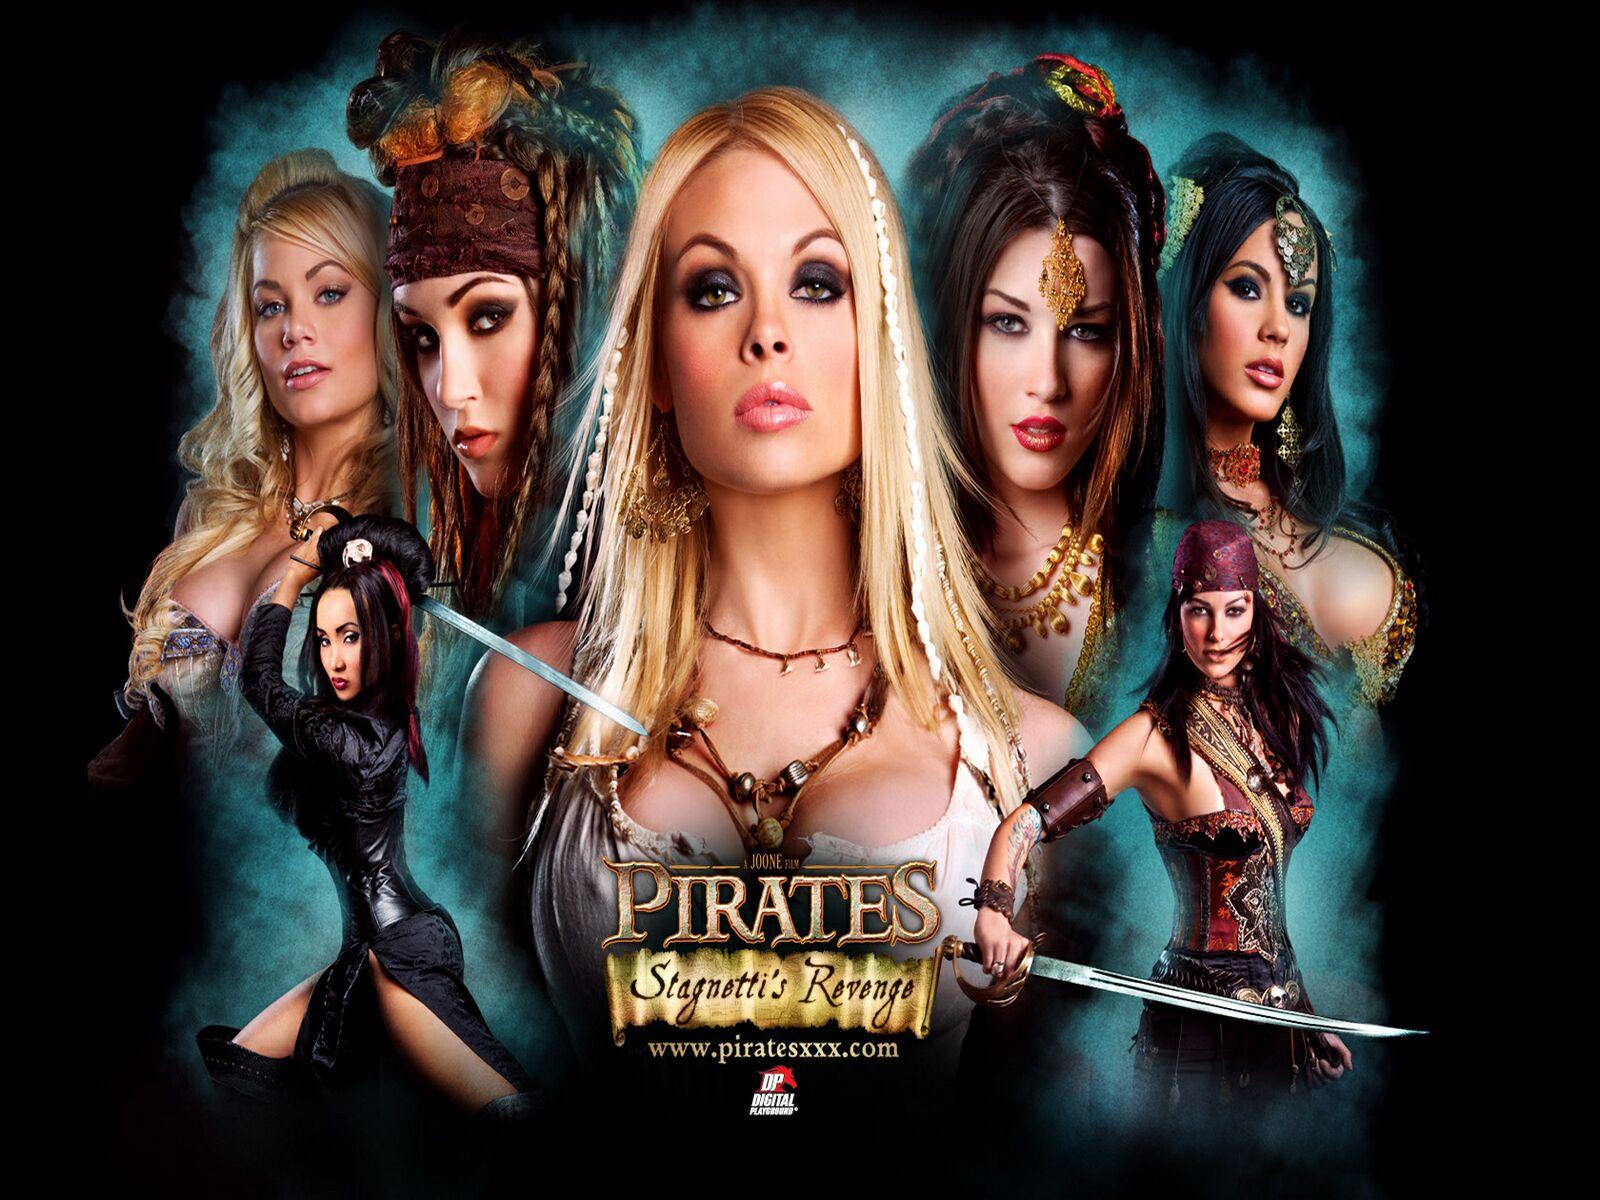 Pirates carabian porn hentai film